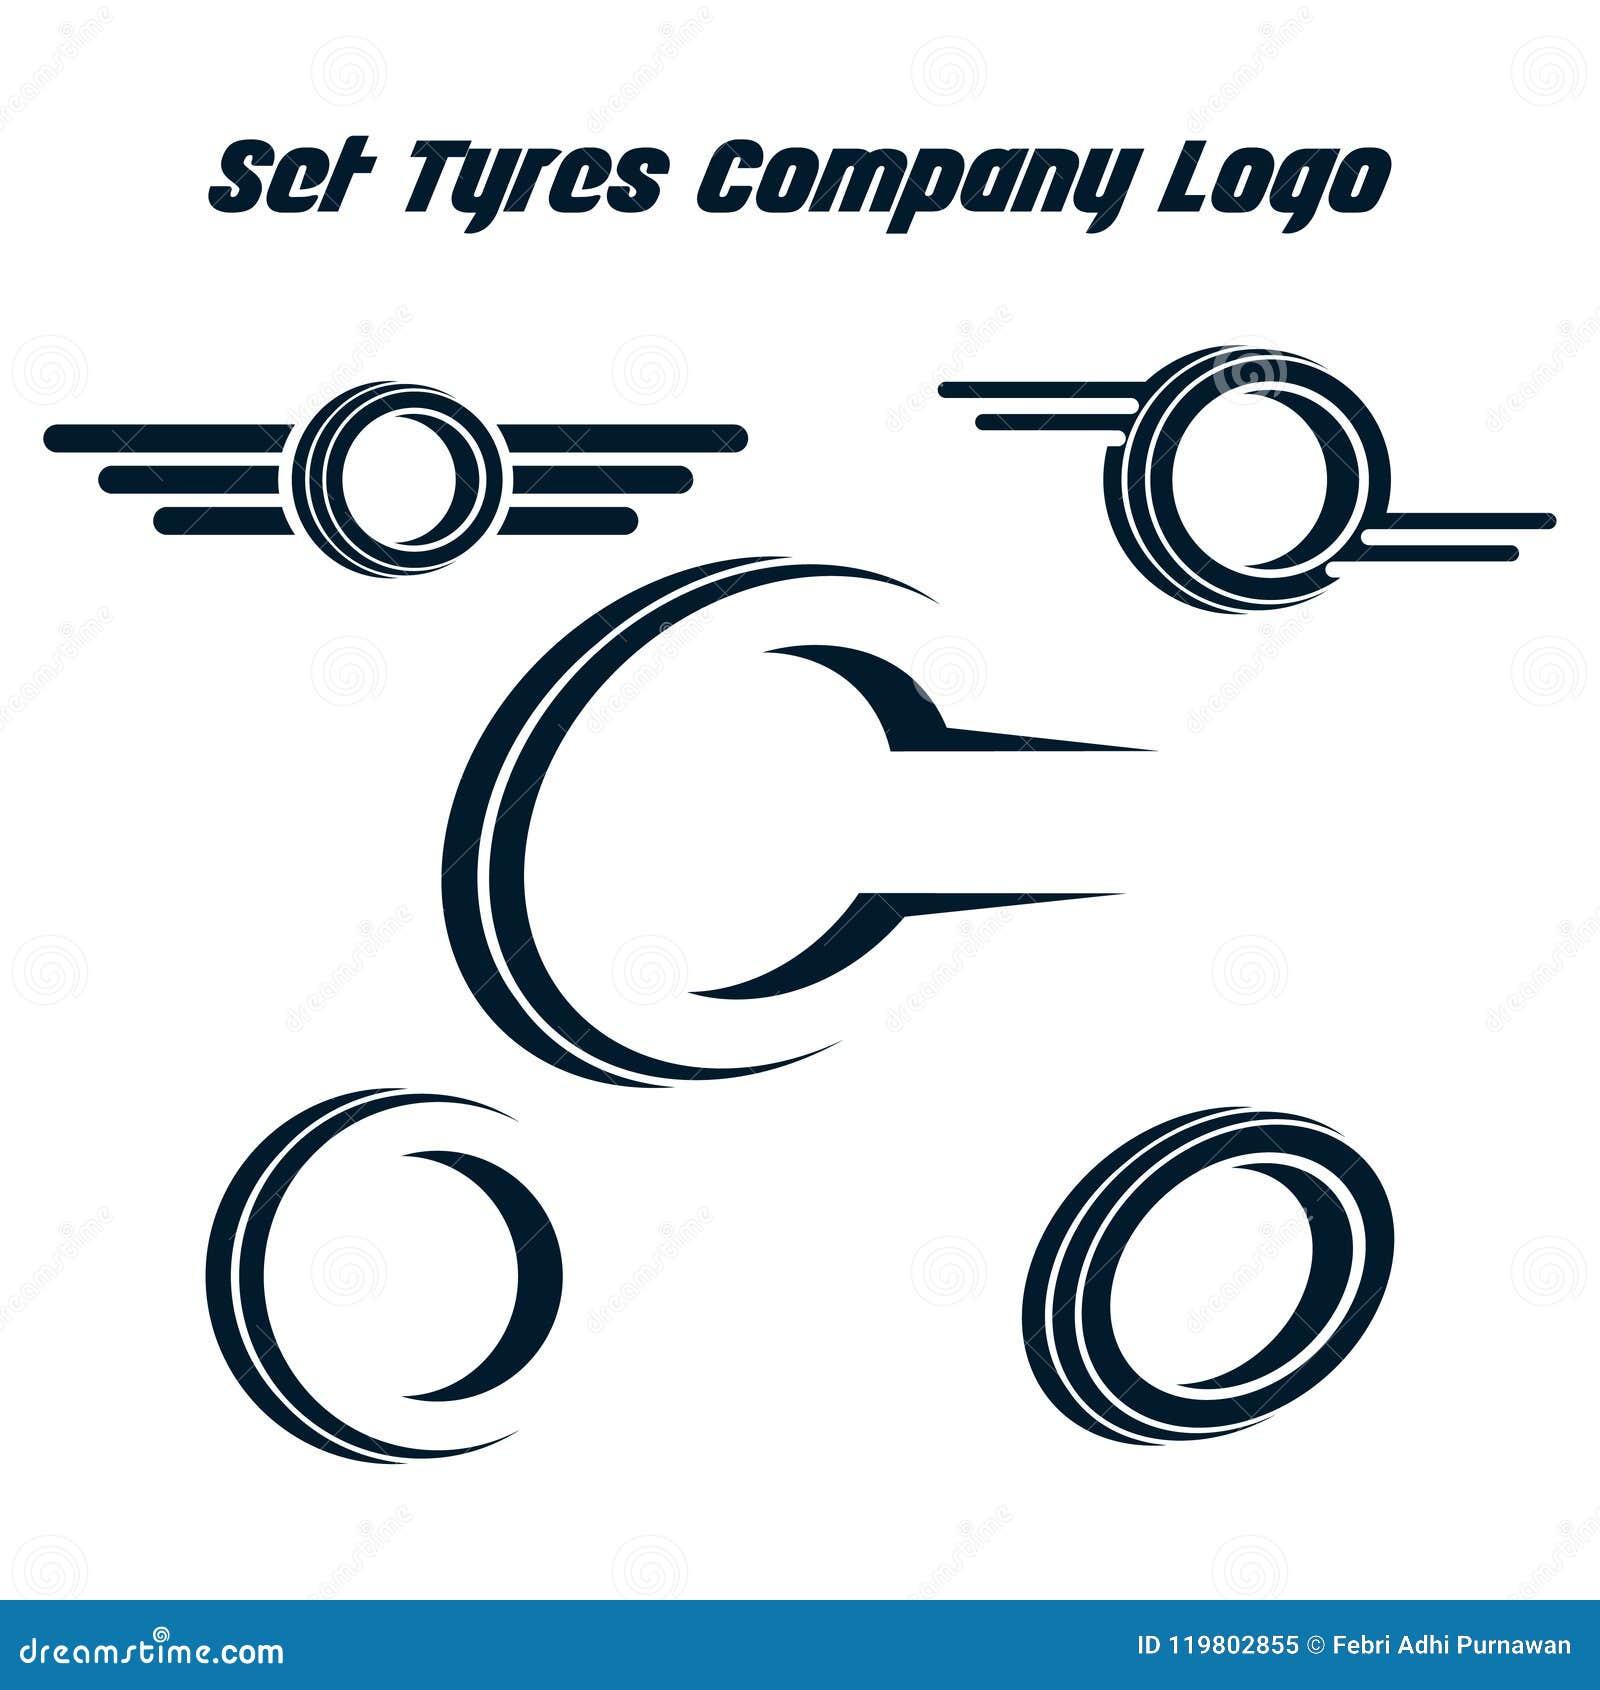 Tyre Shop Logo Design Tyre Business Branding Tyre Logo Shop Icons